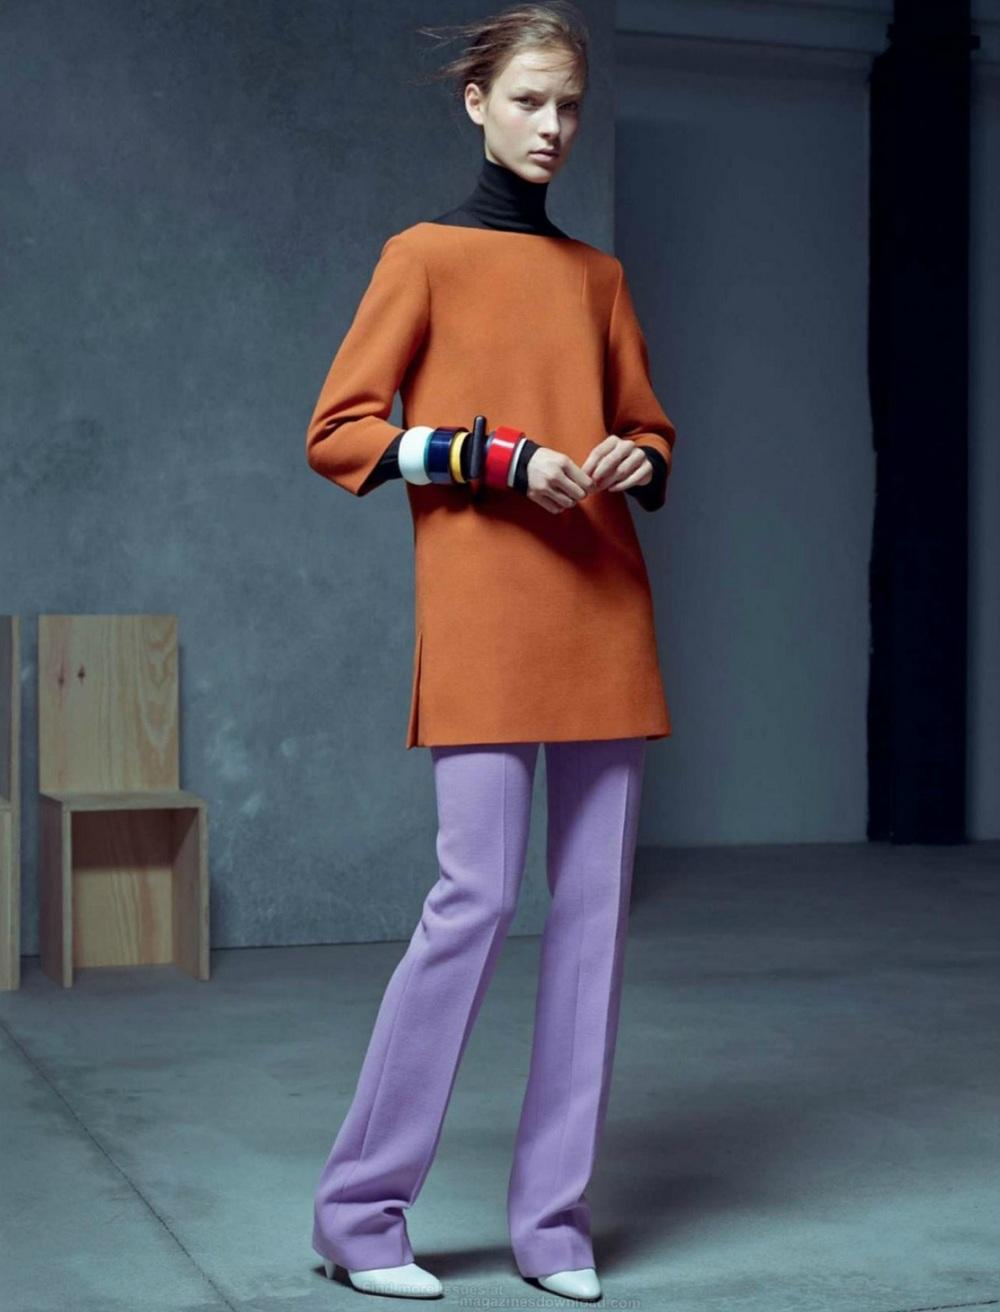 Karim-Sadli-Julia-Bergshoeff-Vogue-UK-January-2015-8.jpg